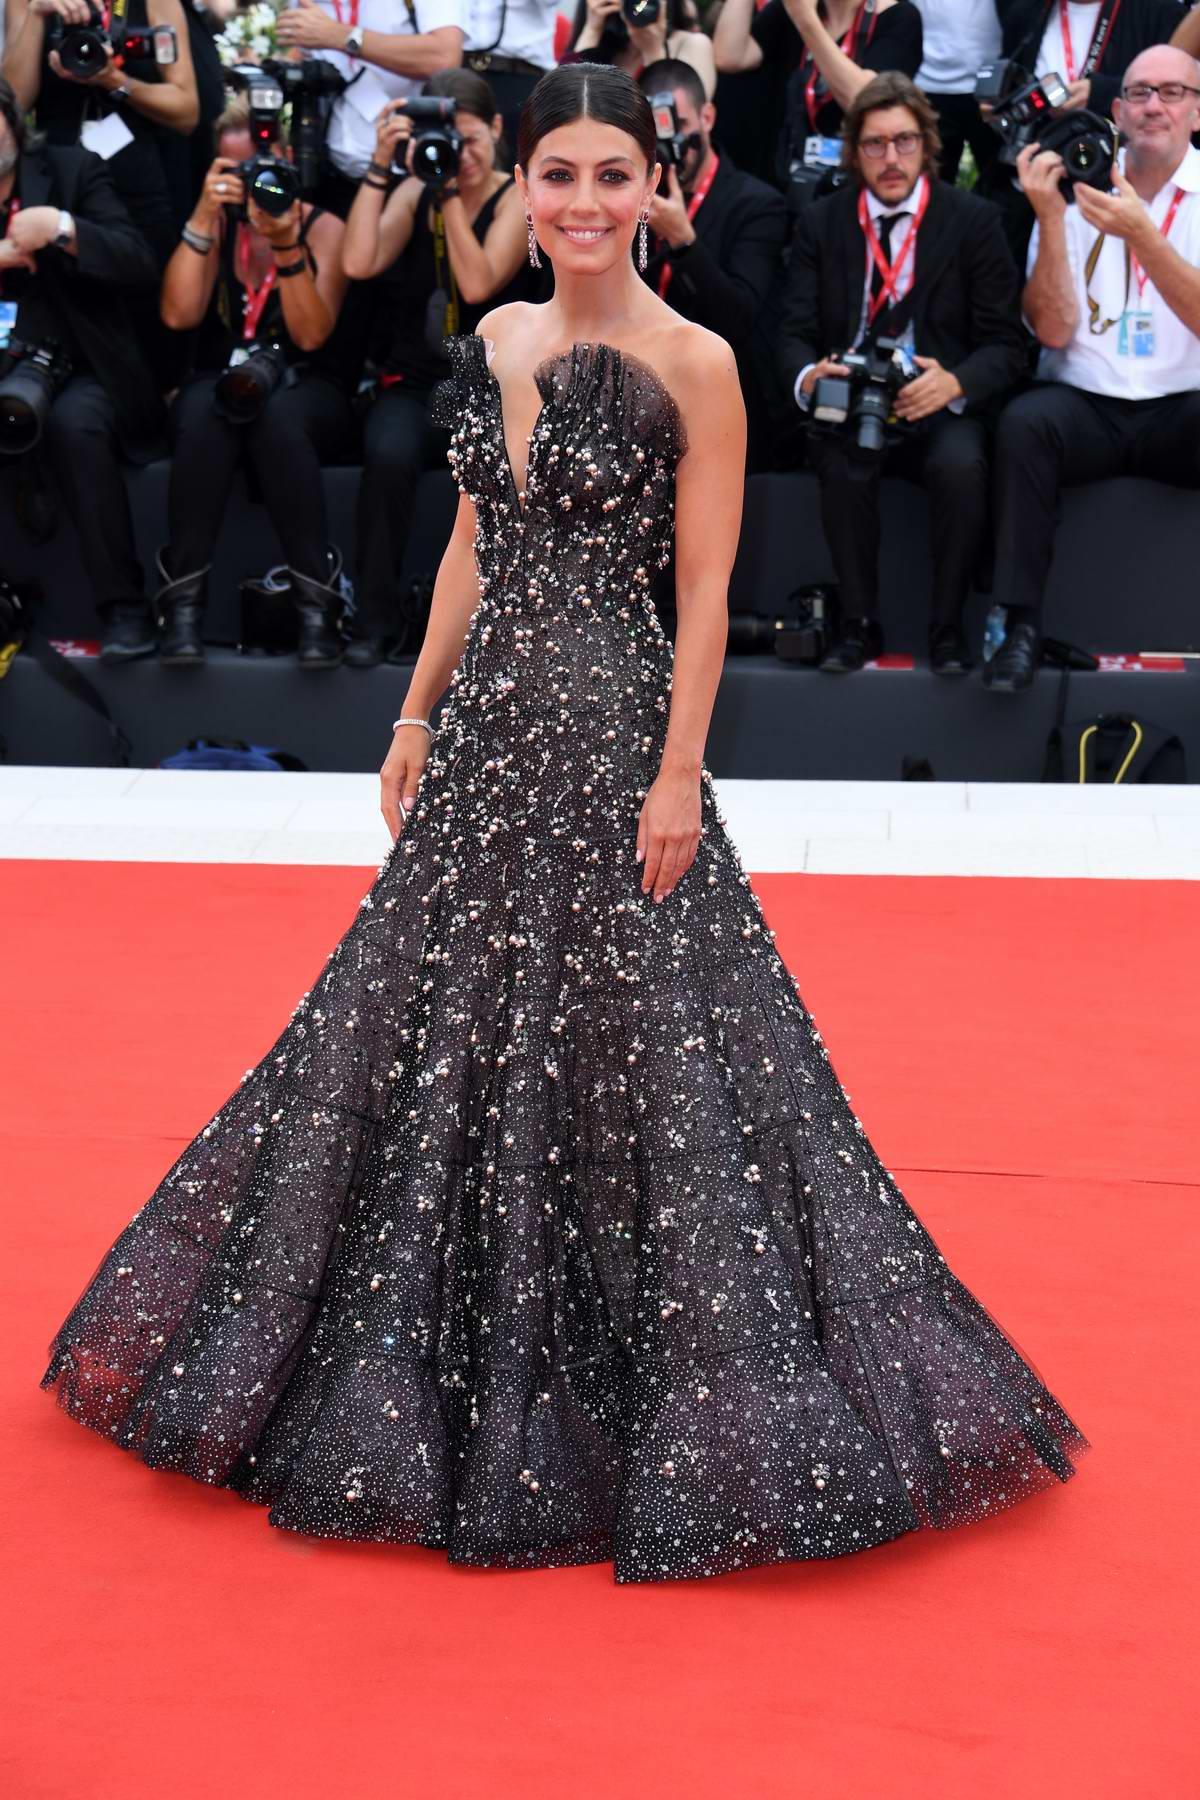 Alessandra Mastronardi attends 'La Vérité' (The Truth) screening during the 76th Venice Film Festival in Venice, Italy